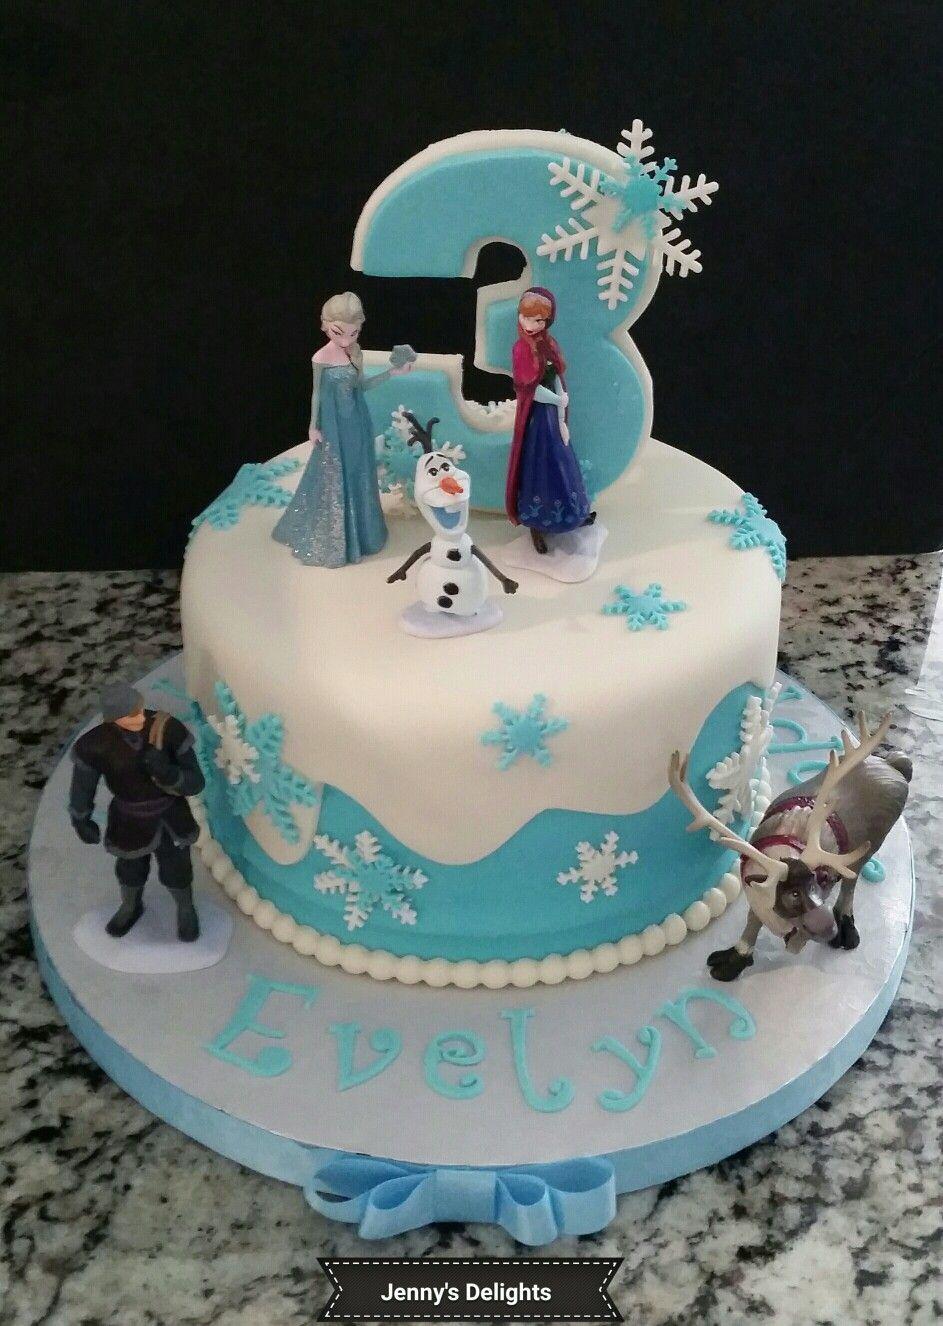 25713ecabc Frozen Themed Fondant Cake with Elsa